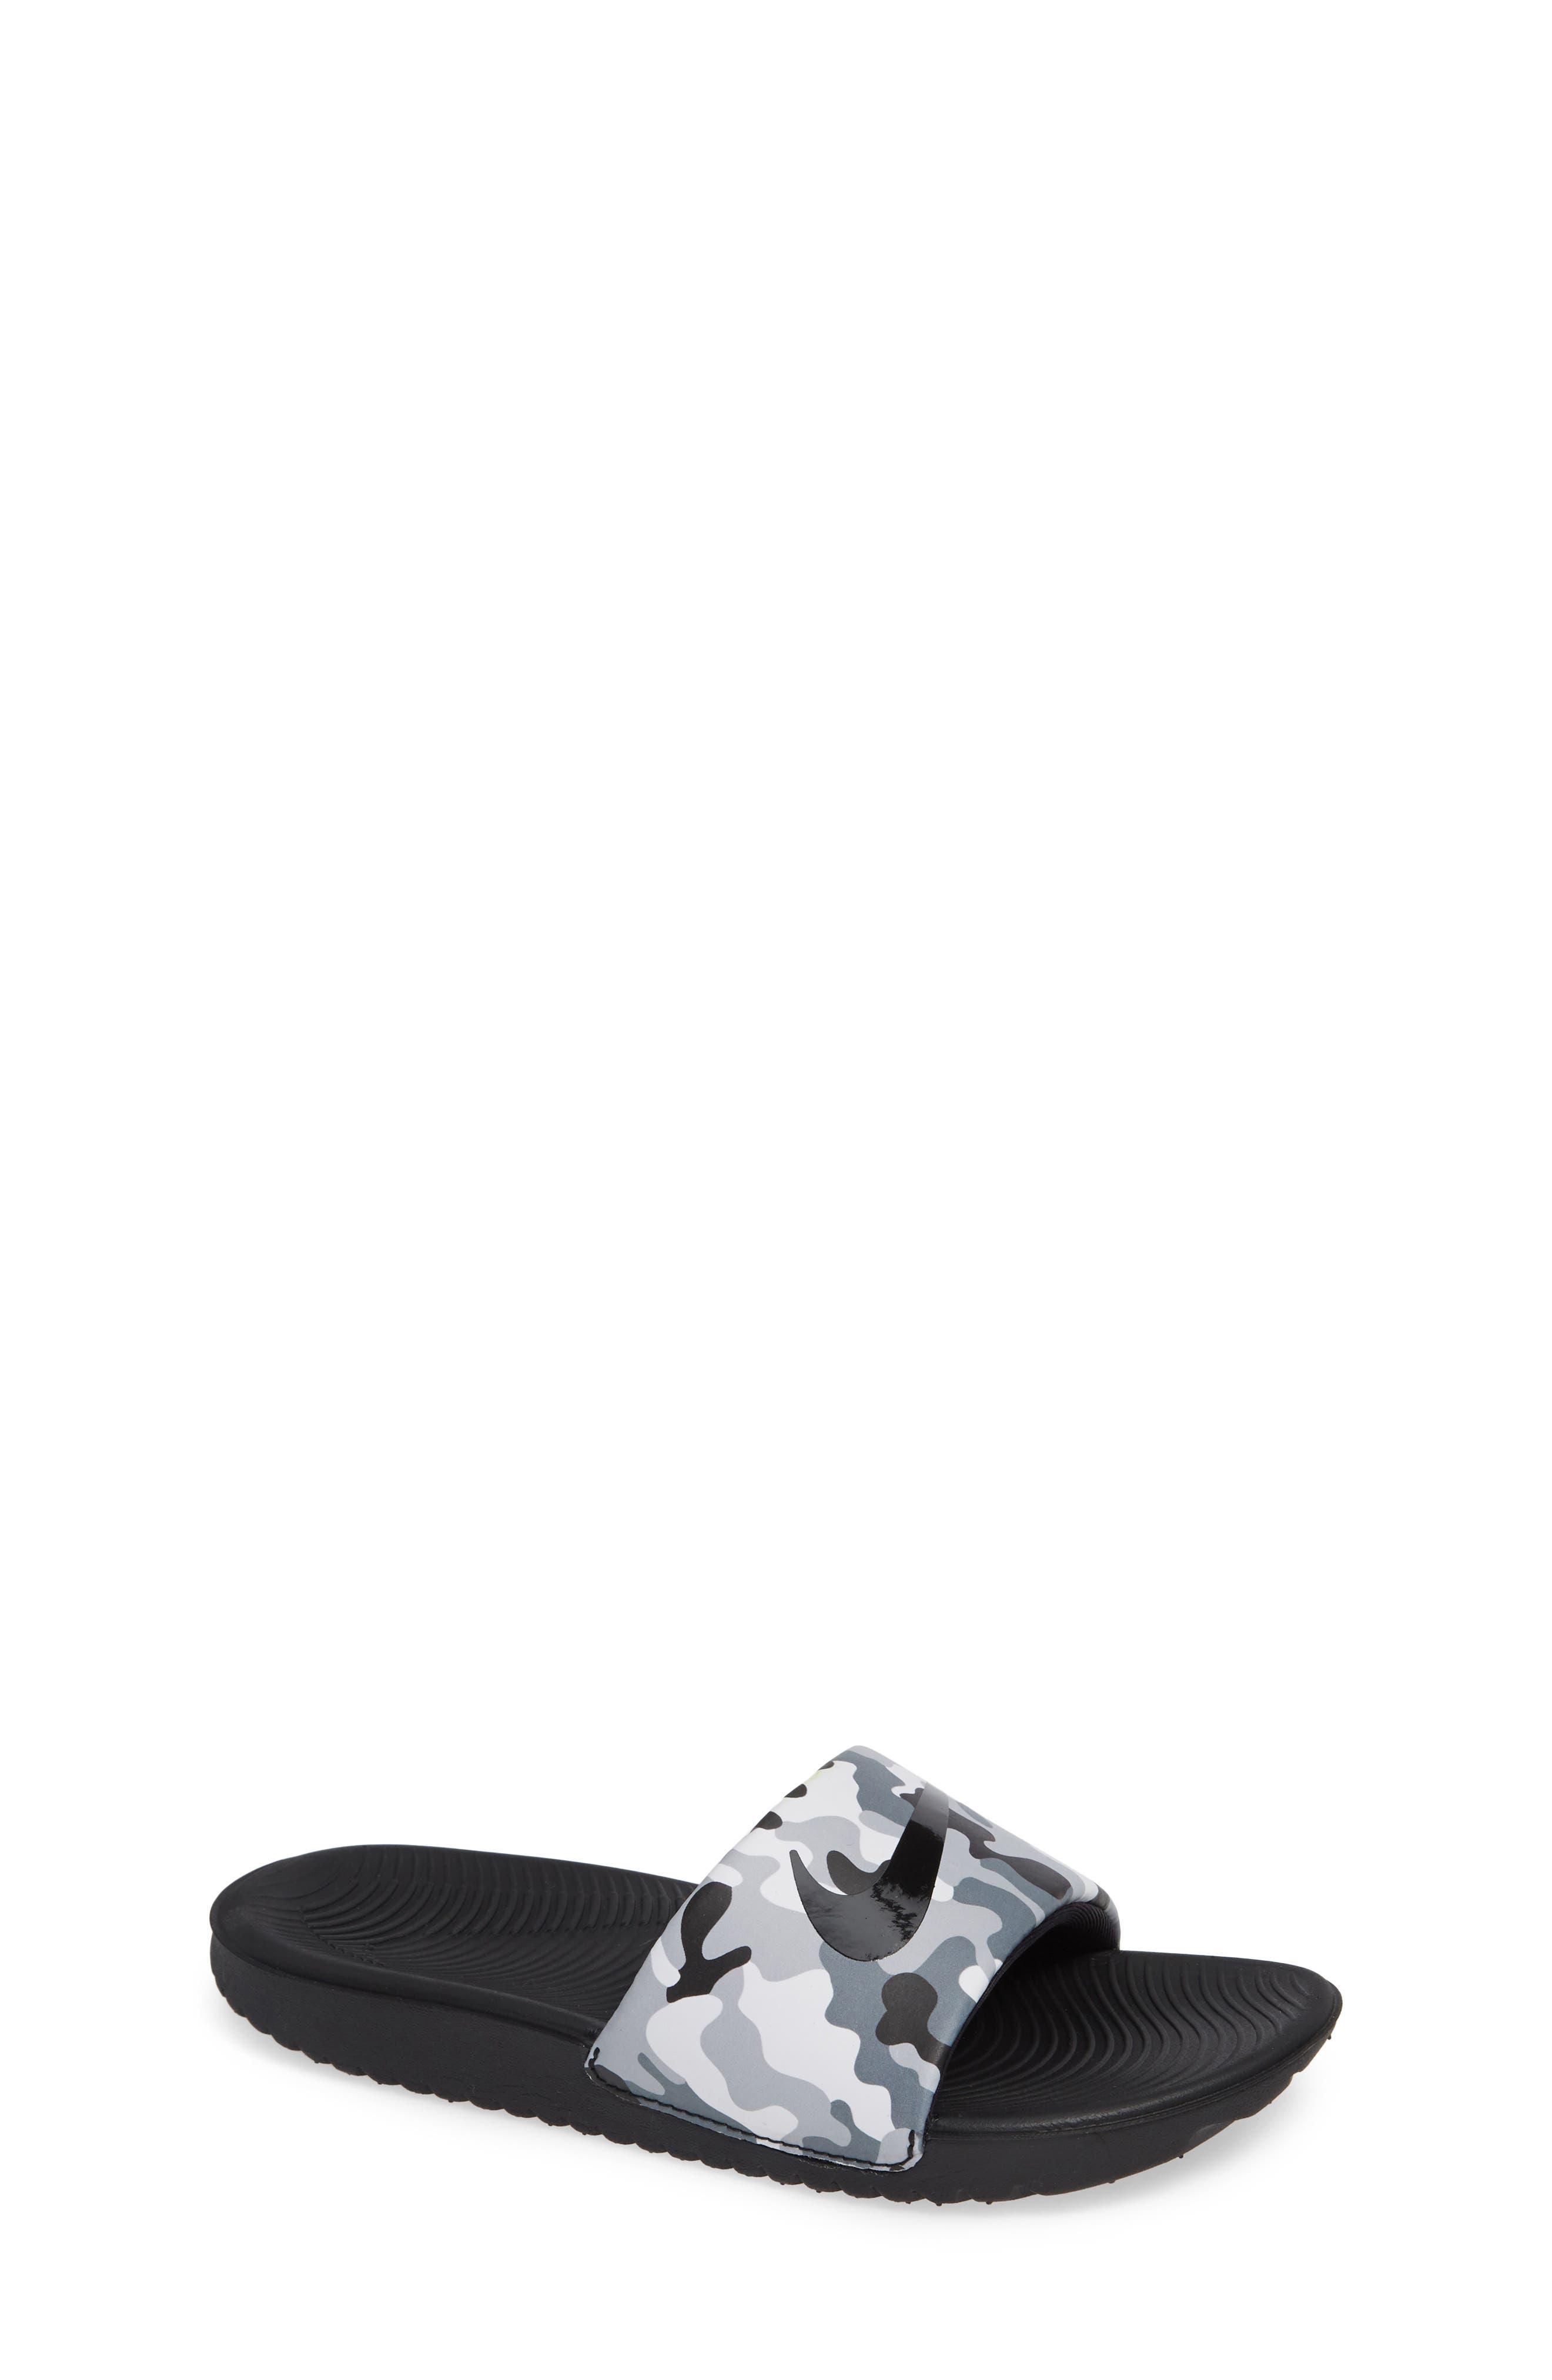 NIKE Kawa Slide Sandal, Main, color, WOLF GREY/ BLACK/ WHITE